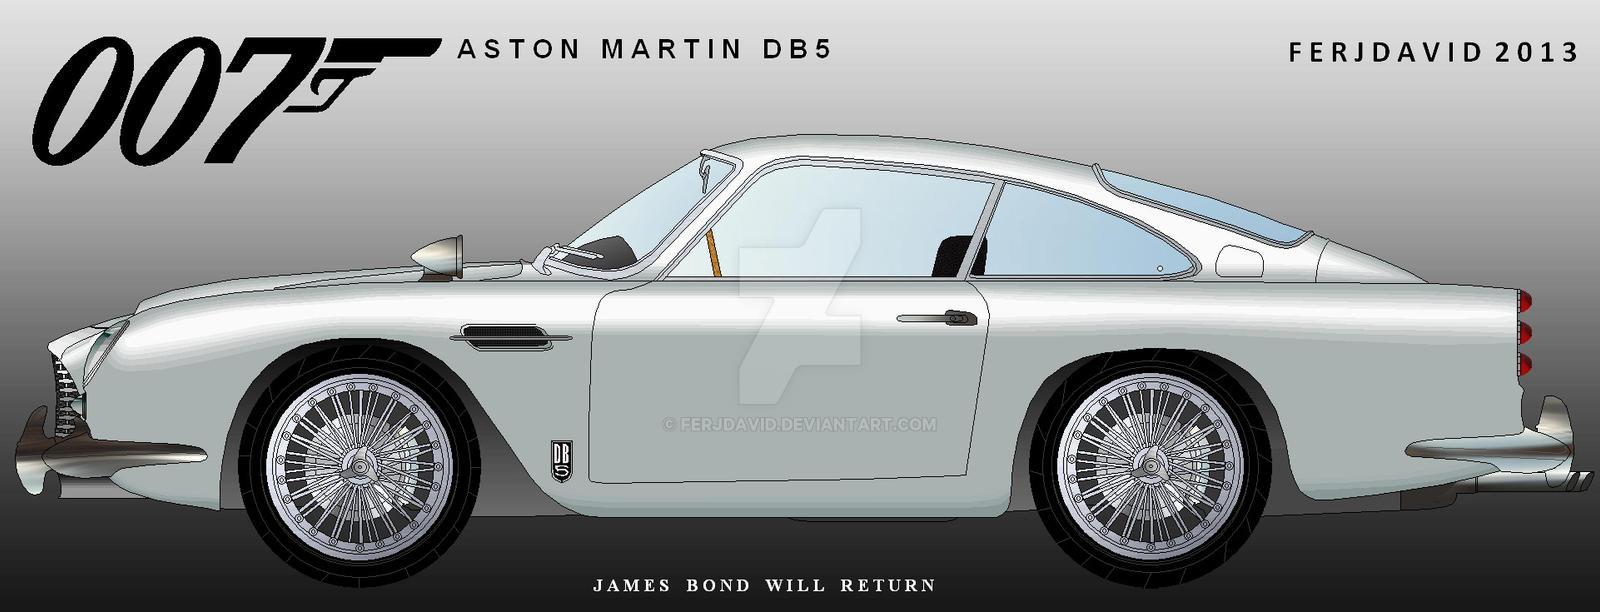 james bond 007 sean connery aston martin db5 by ferjdavid on deviantart. Black Bedroom Furniture Sets. Home Design Ideas